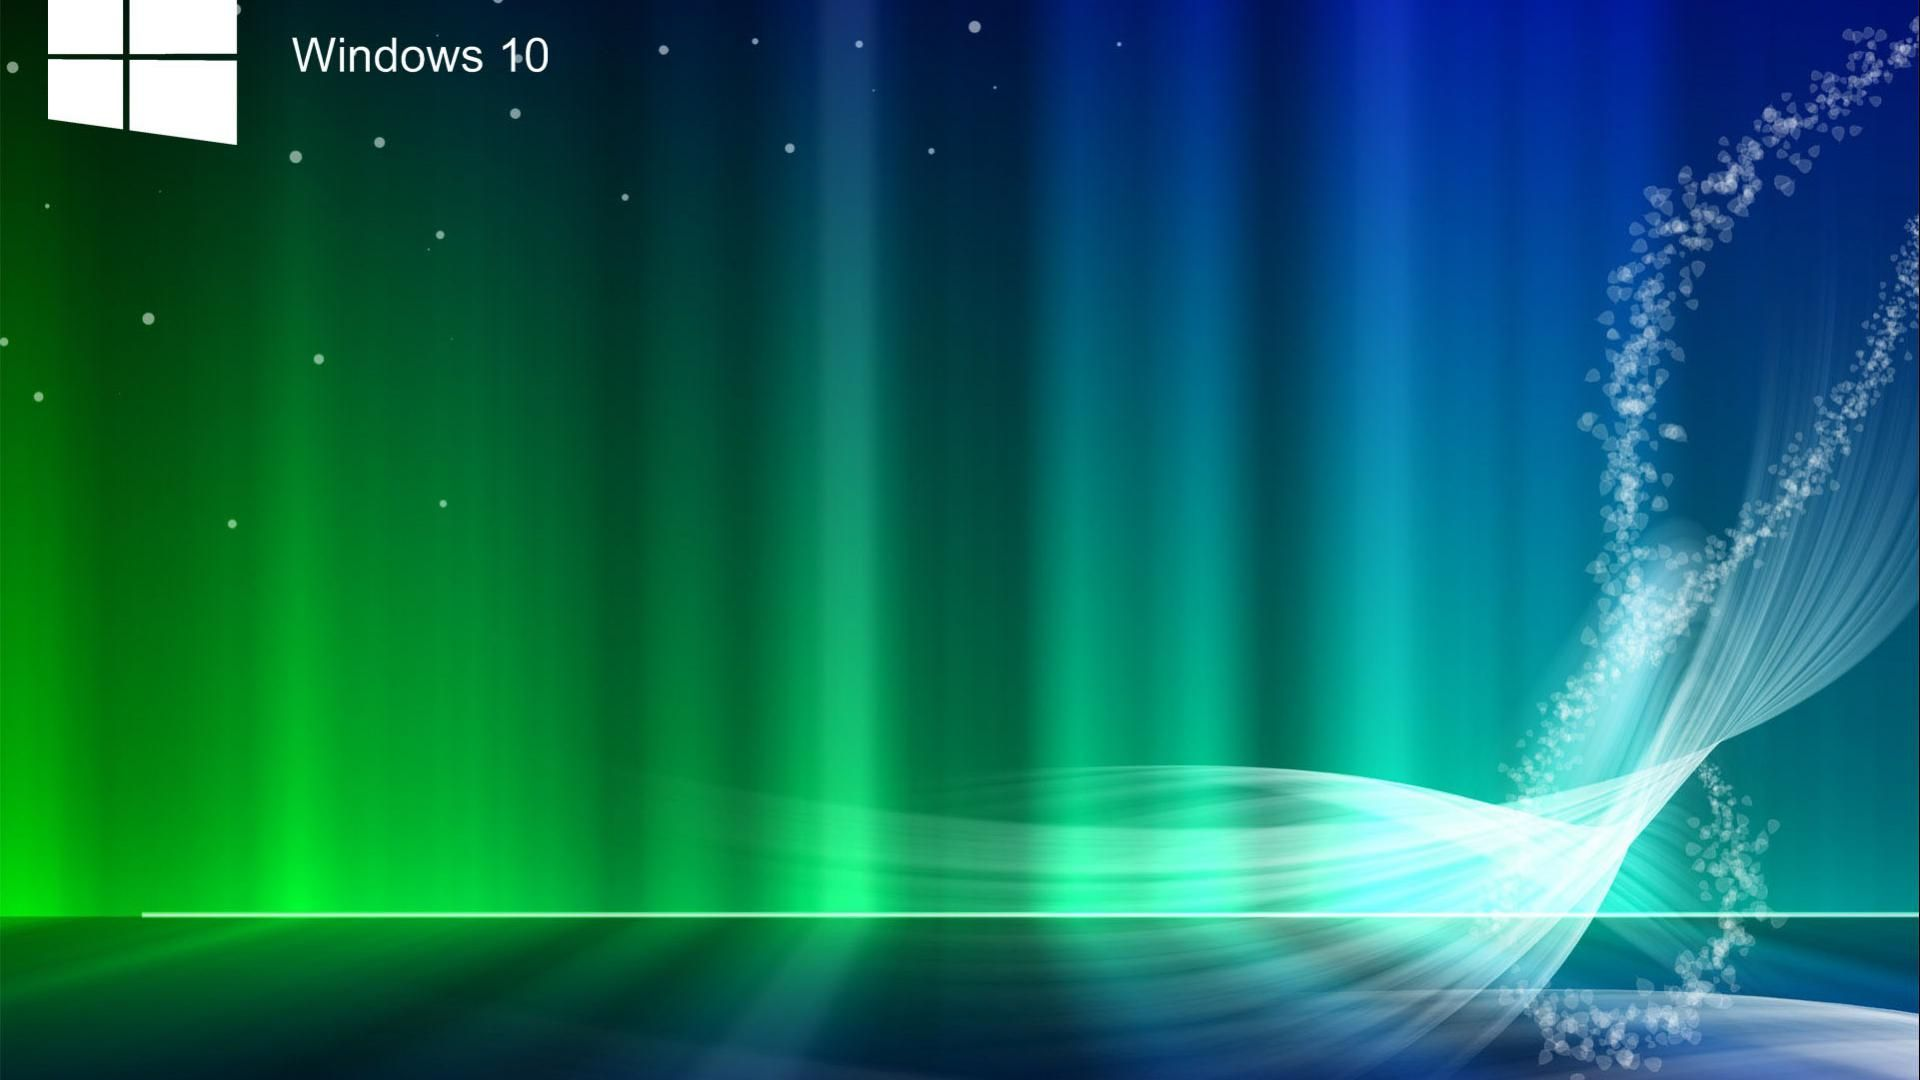 Windows 10 HD Wallpaper 1920x1080 WallpaperSafari in 2019